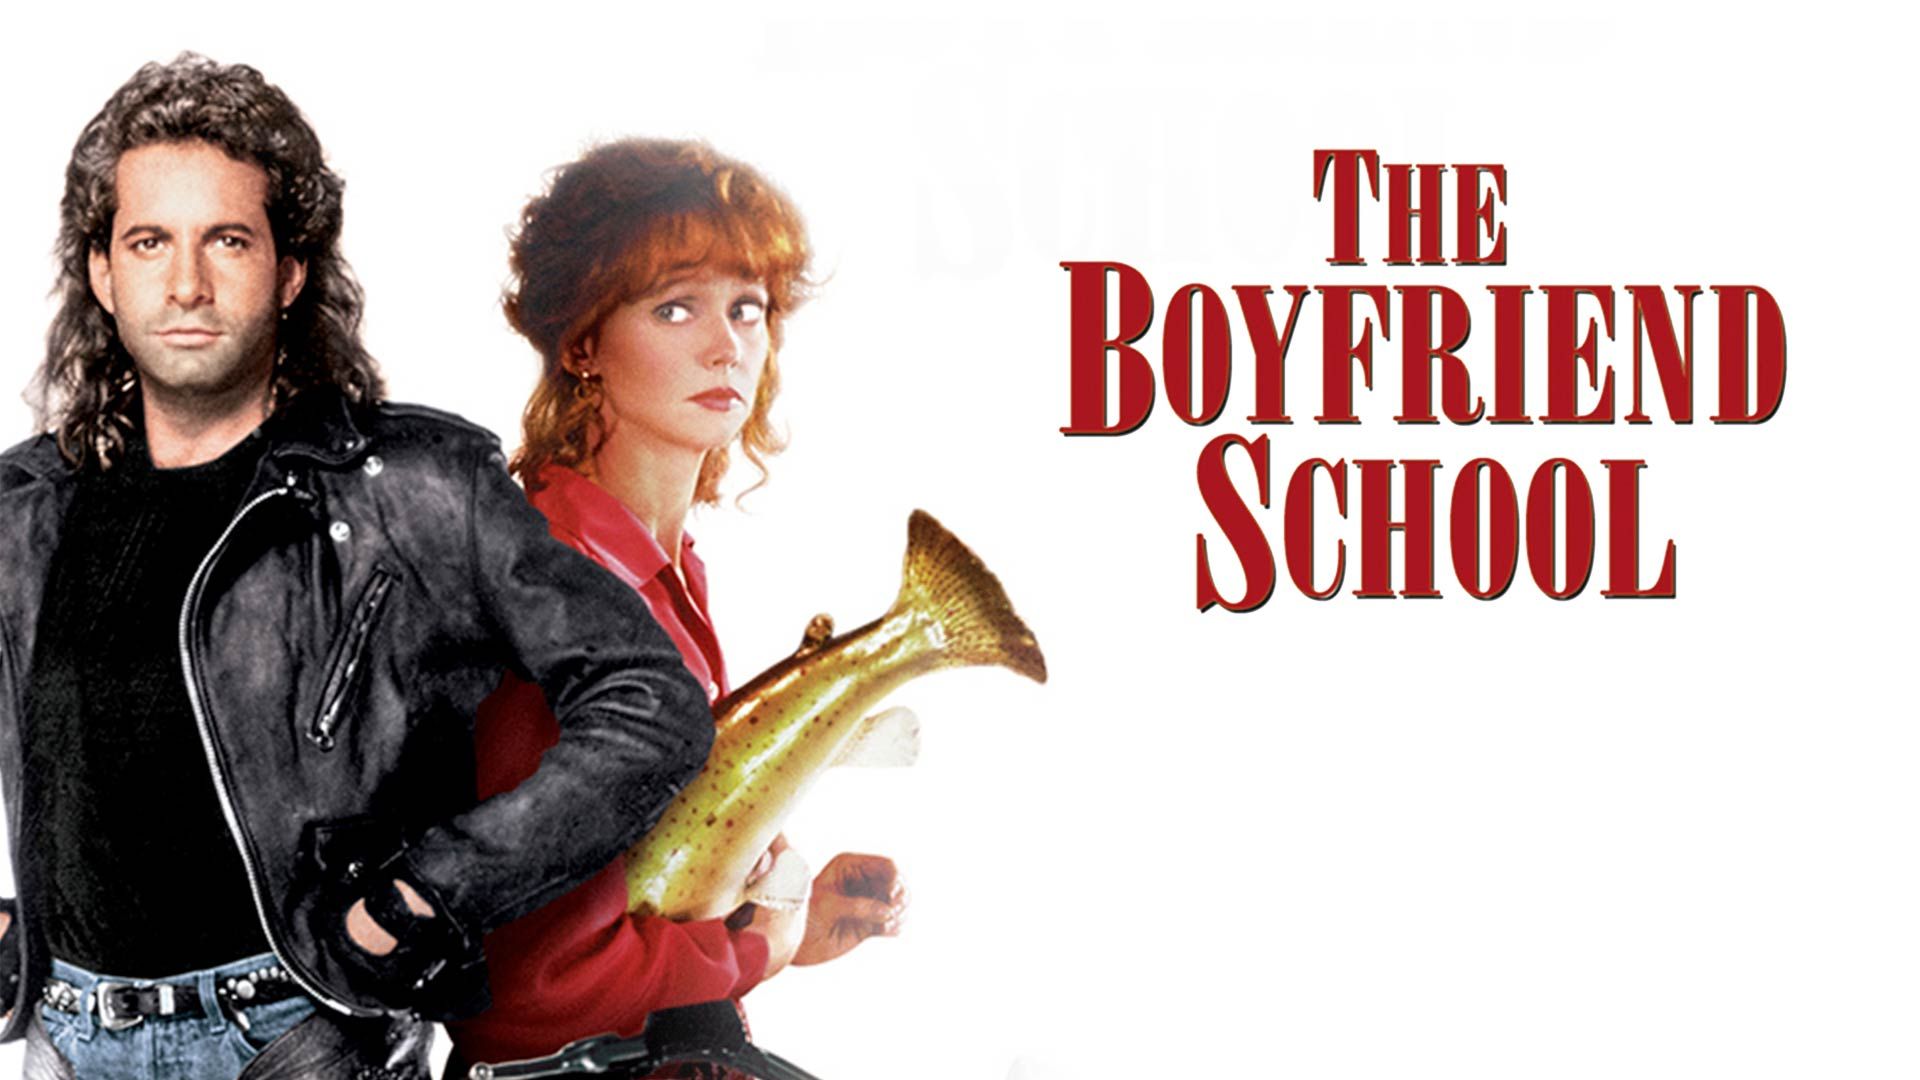 Boyfriend School, The